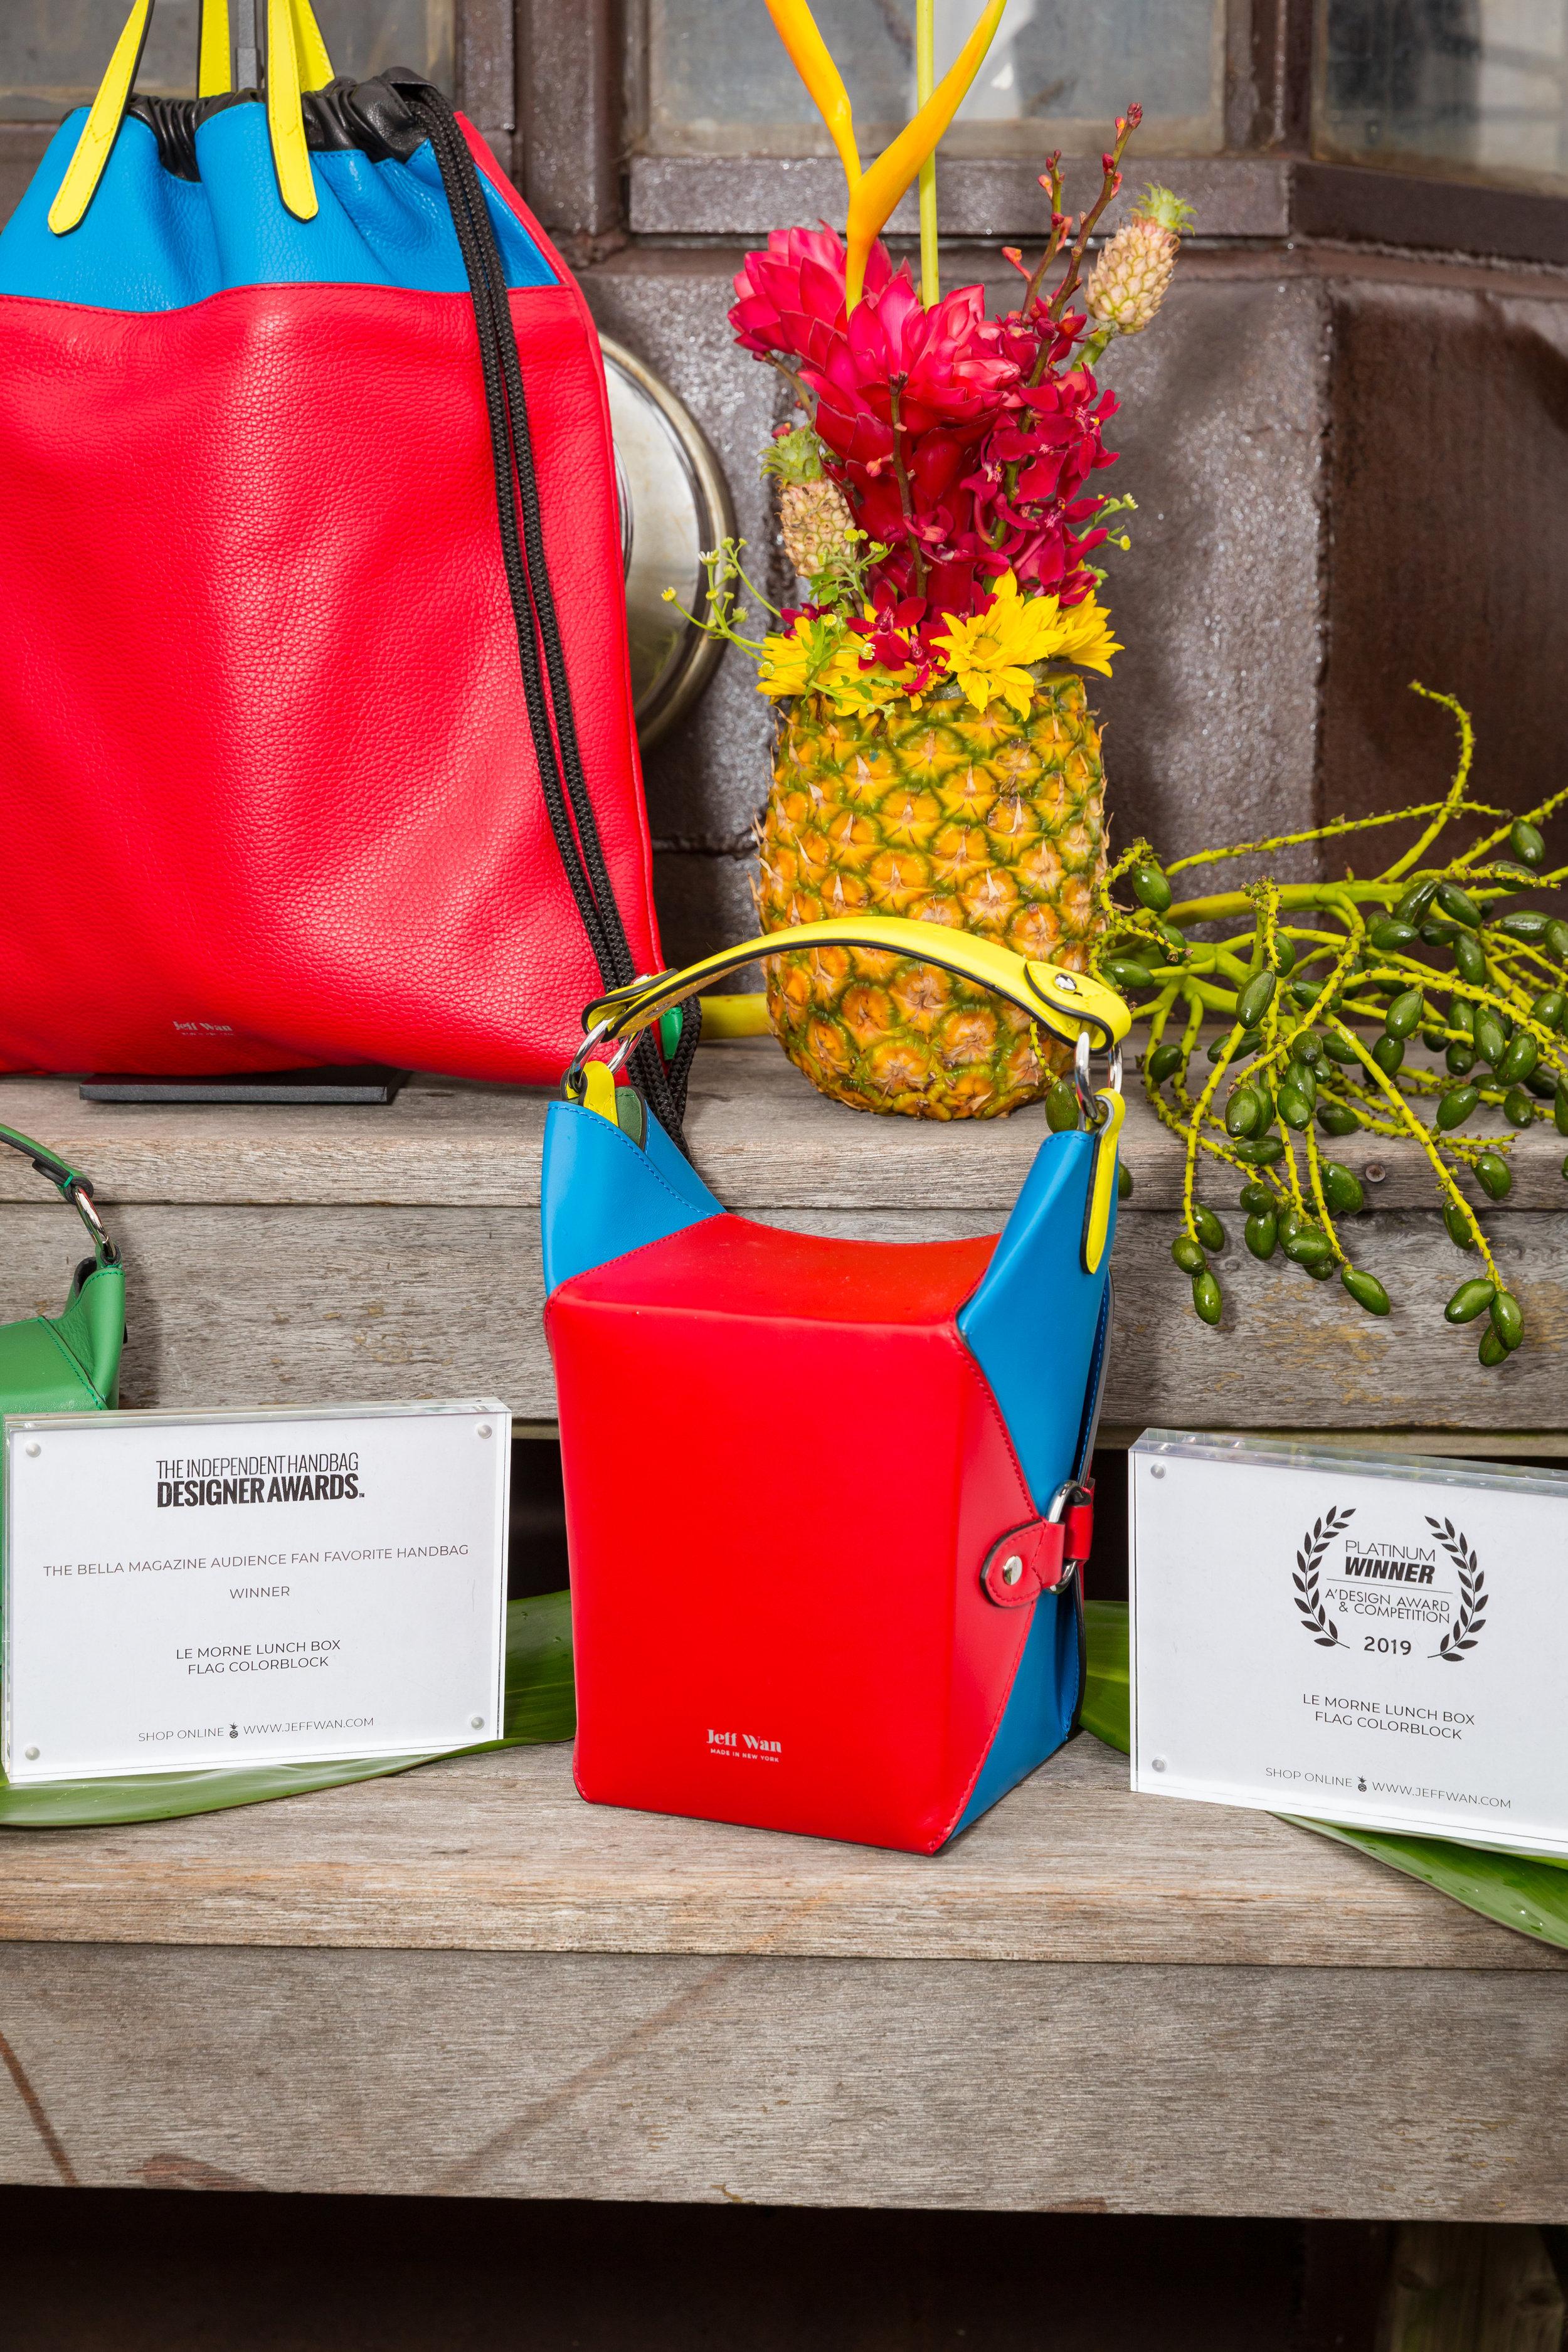 The award-winning Le Morne Lunch Box bag.